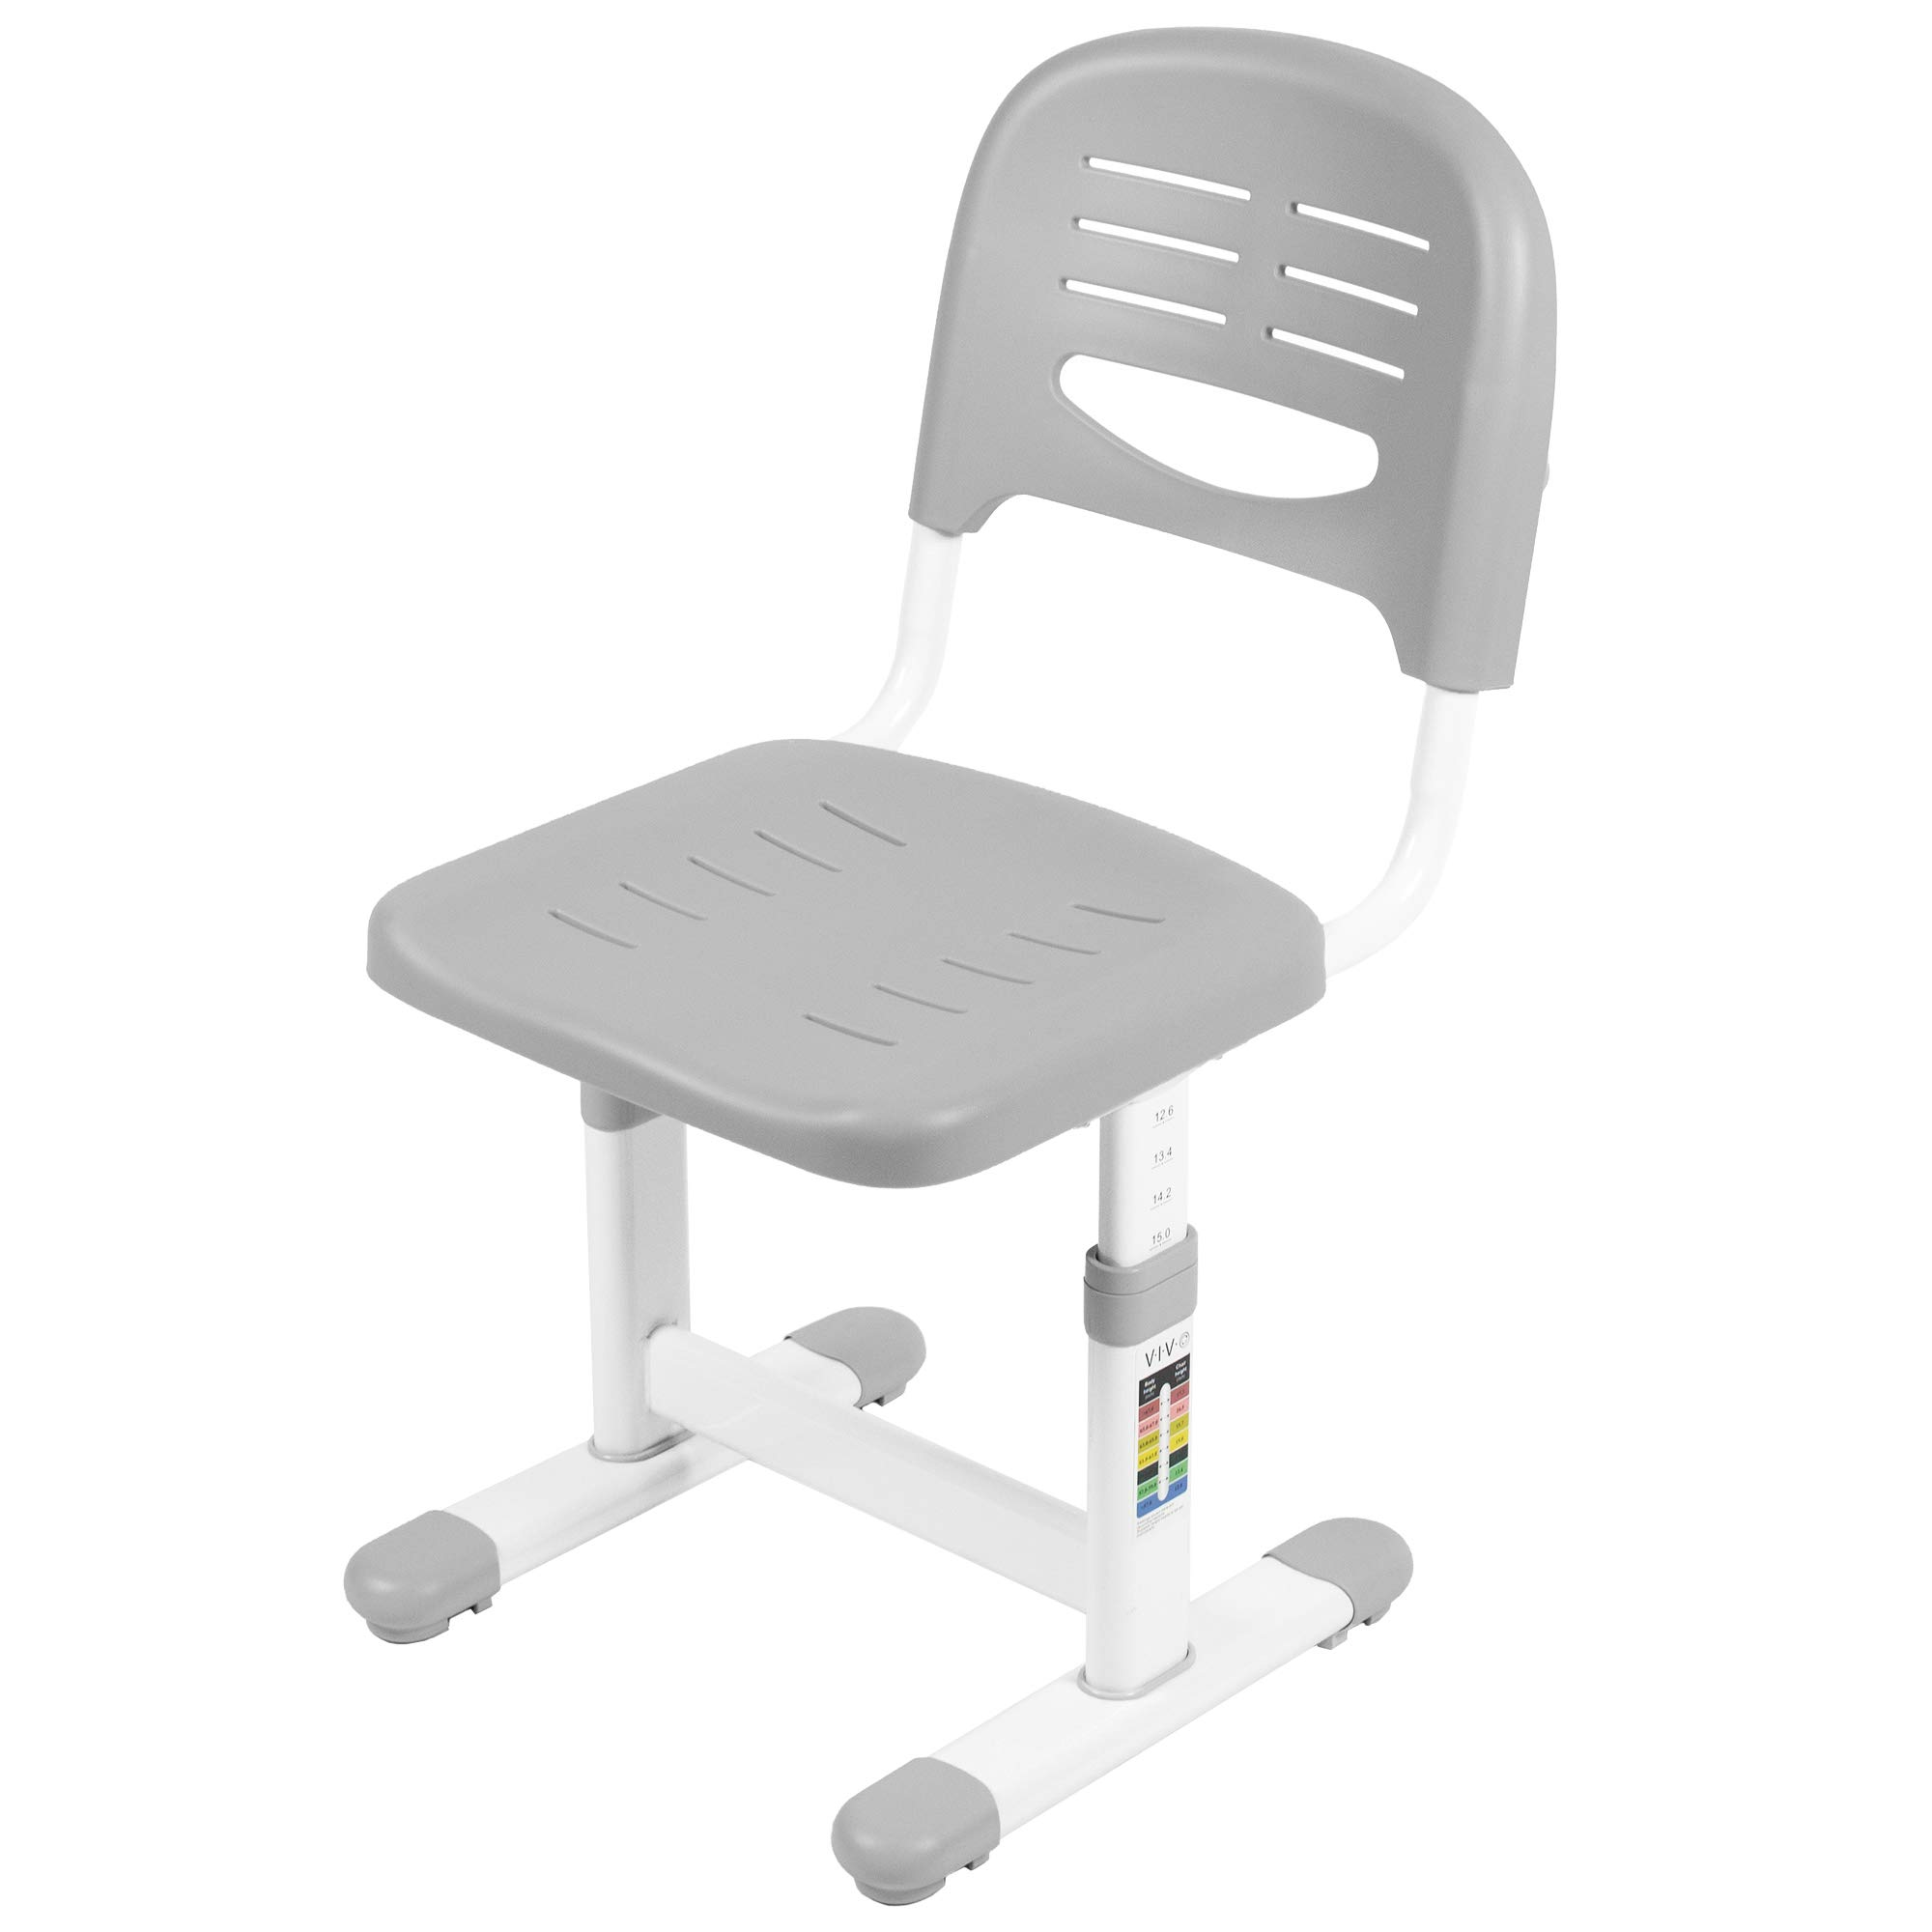 VIVO Gray Height Adjustable Kids Desk Chair (Chair Only) Designed for Interactive Workstation   Universal Children's Ergonomic Seat (DESK-V201G-CH)